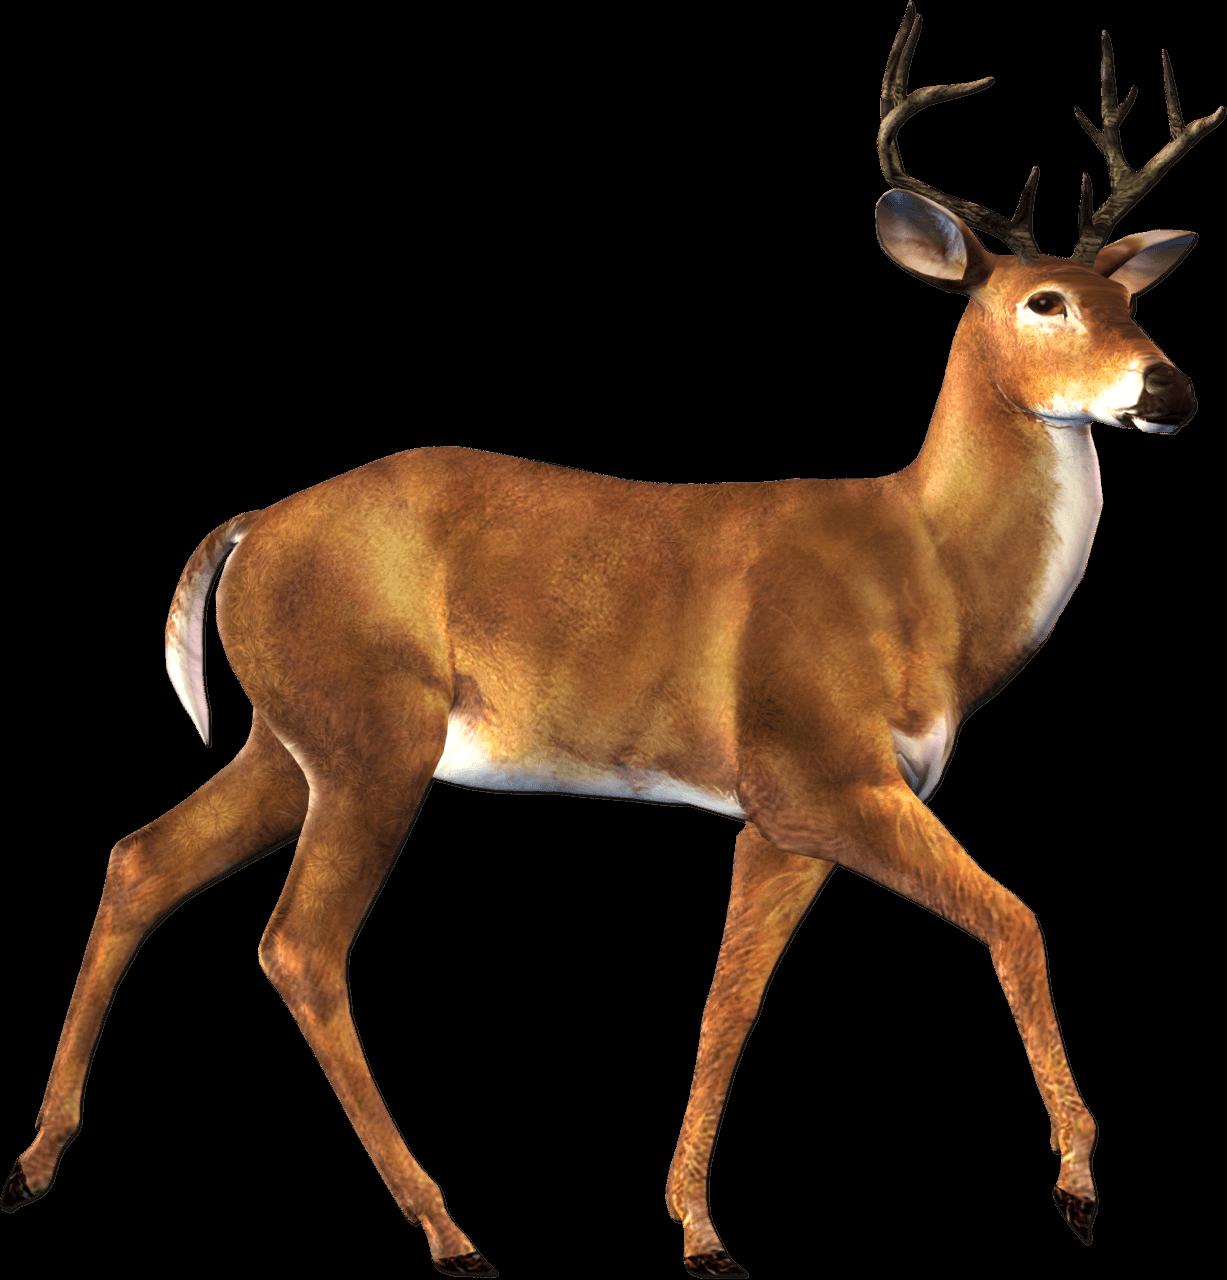 Walking Deer Sideview transparent PNG.